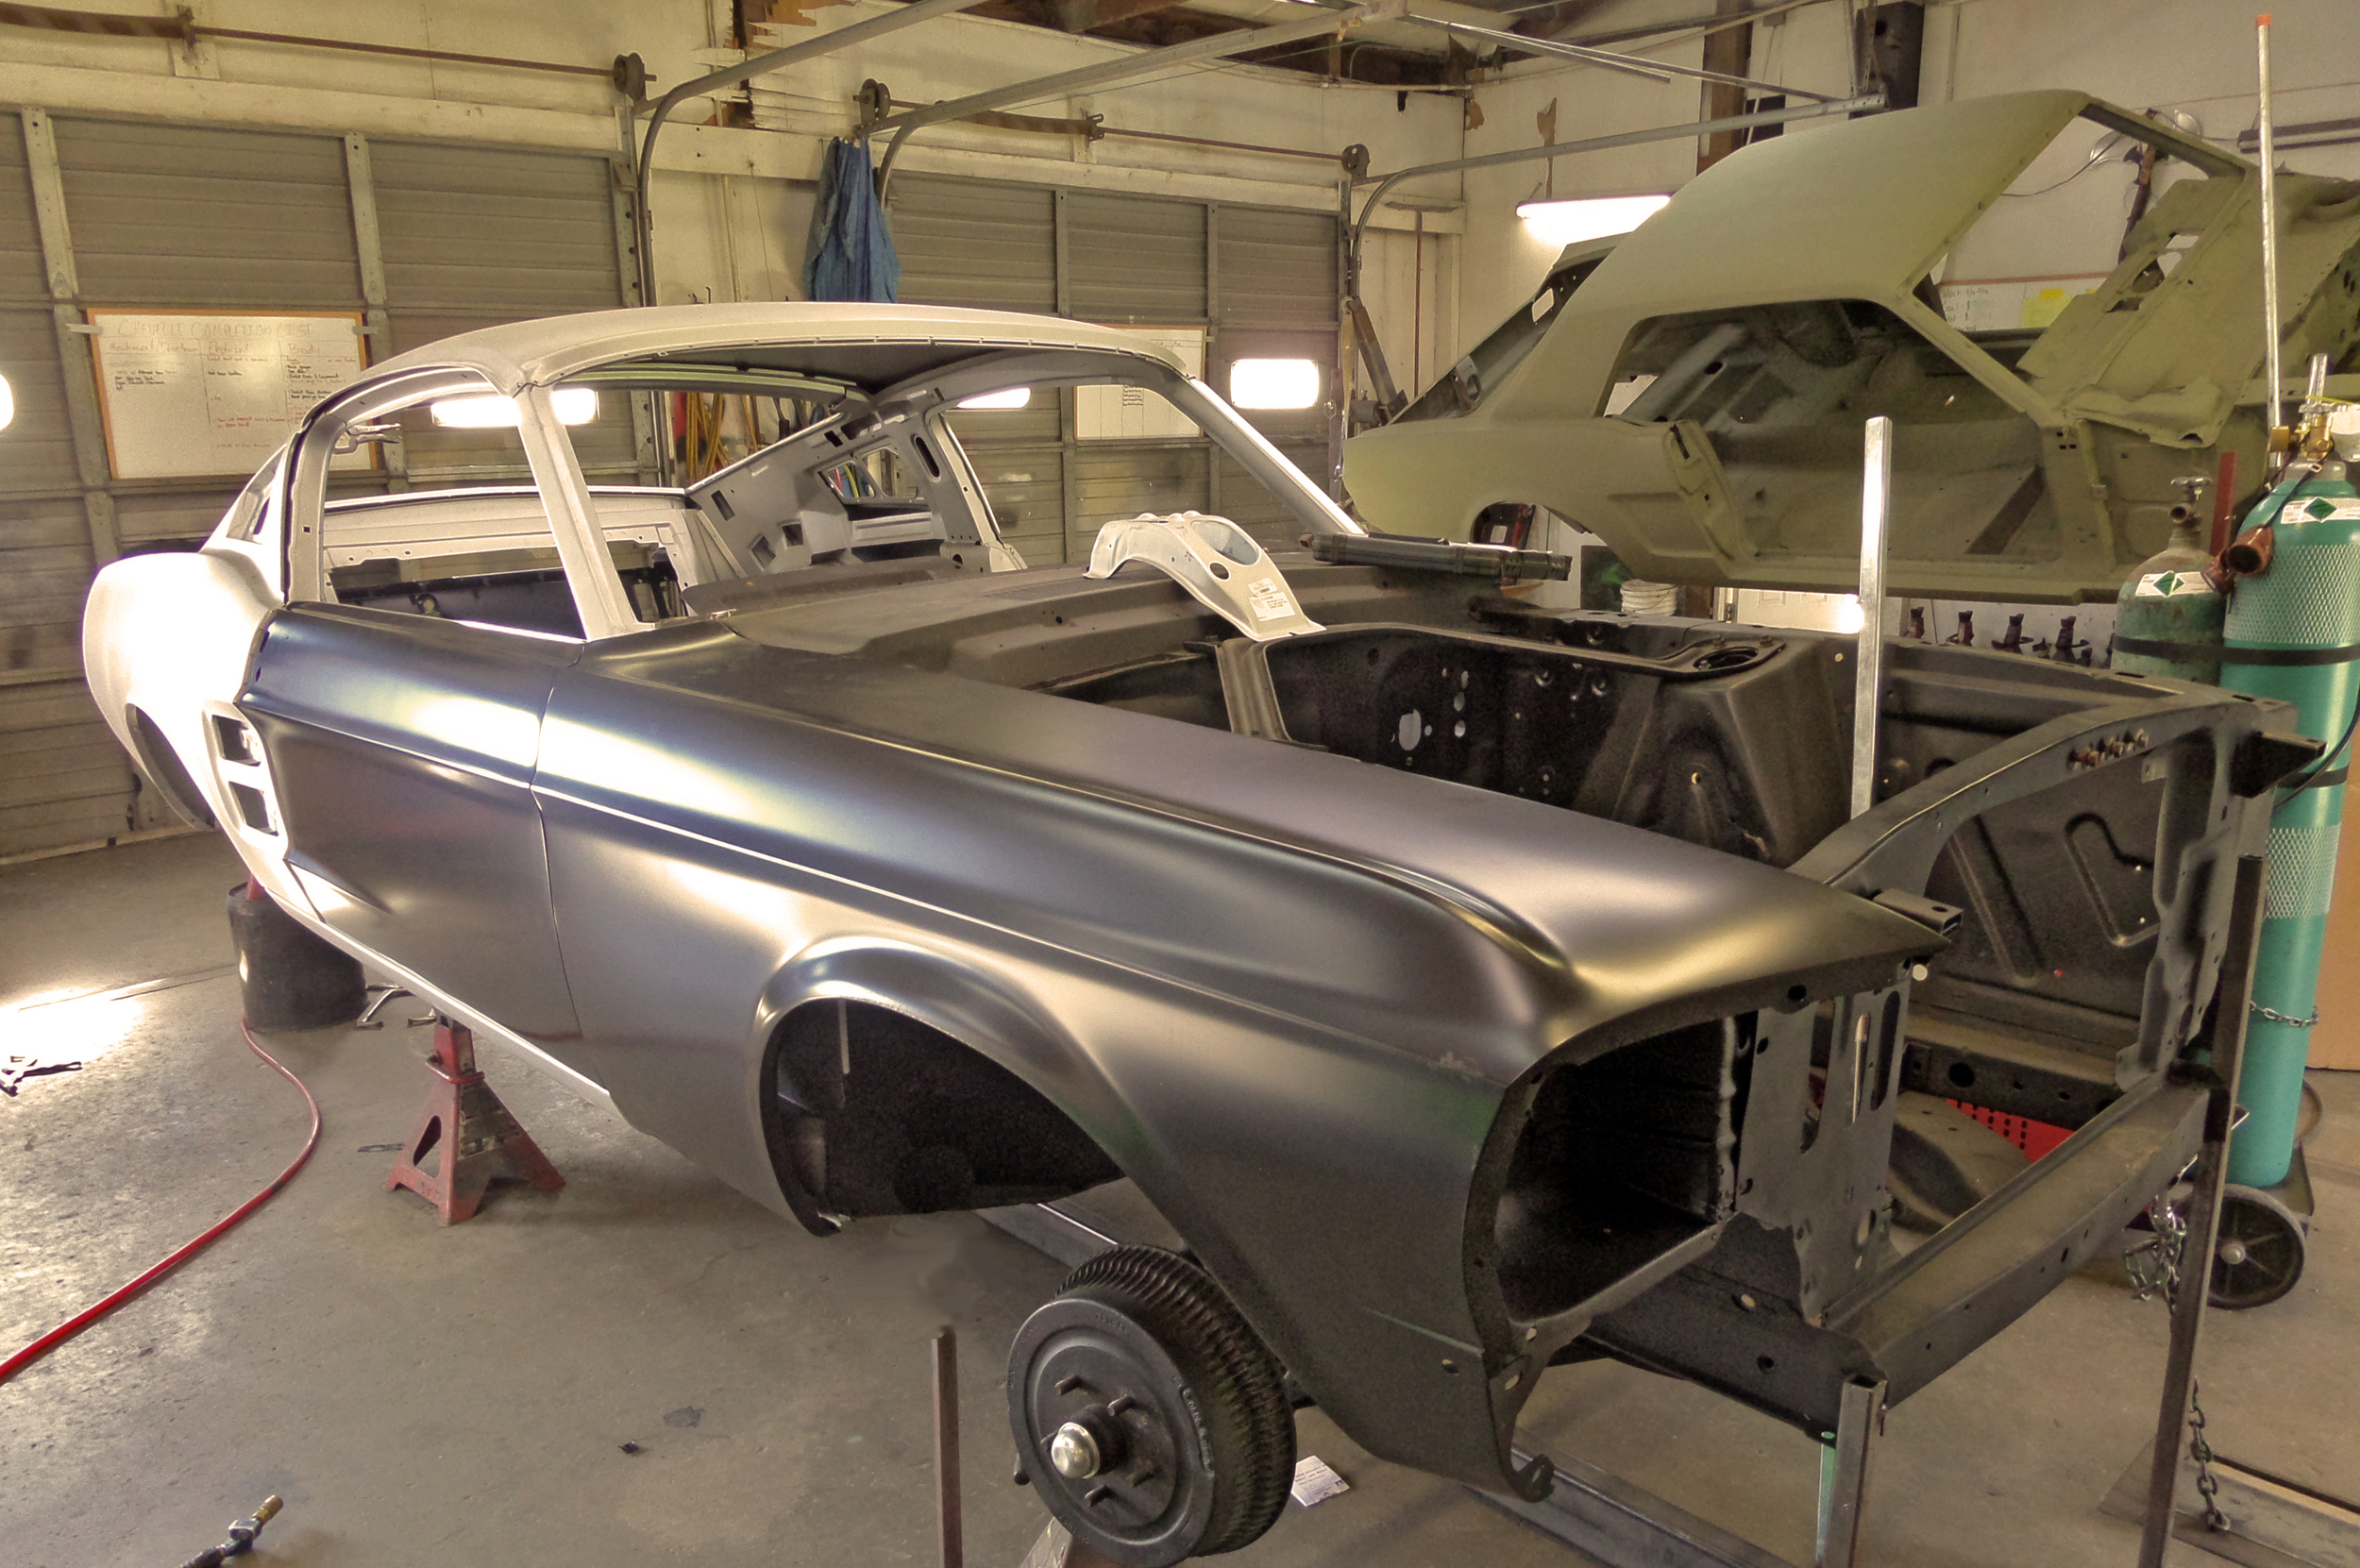 1967 Mustang Fastback Conversion